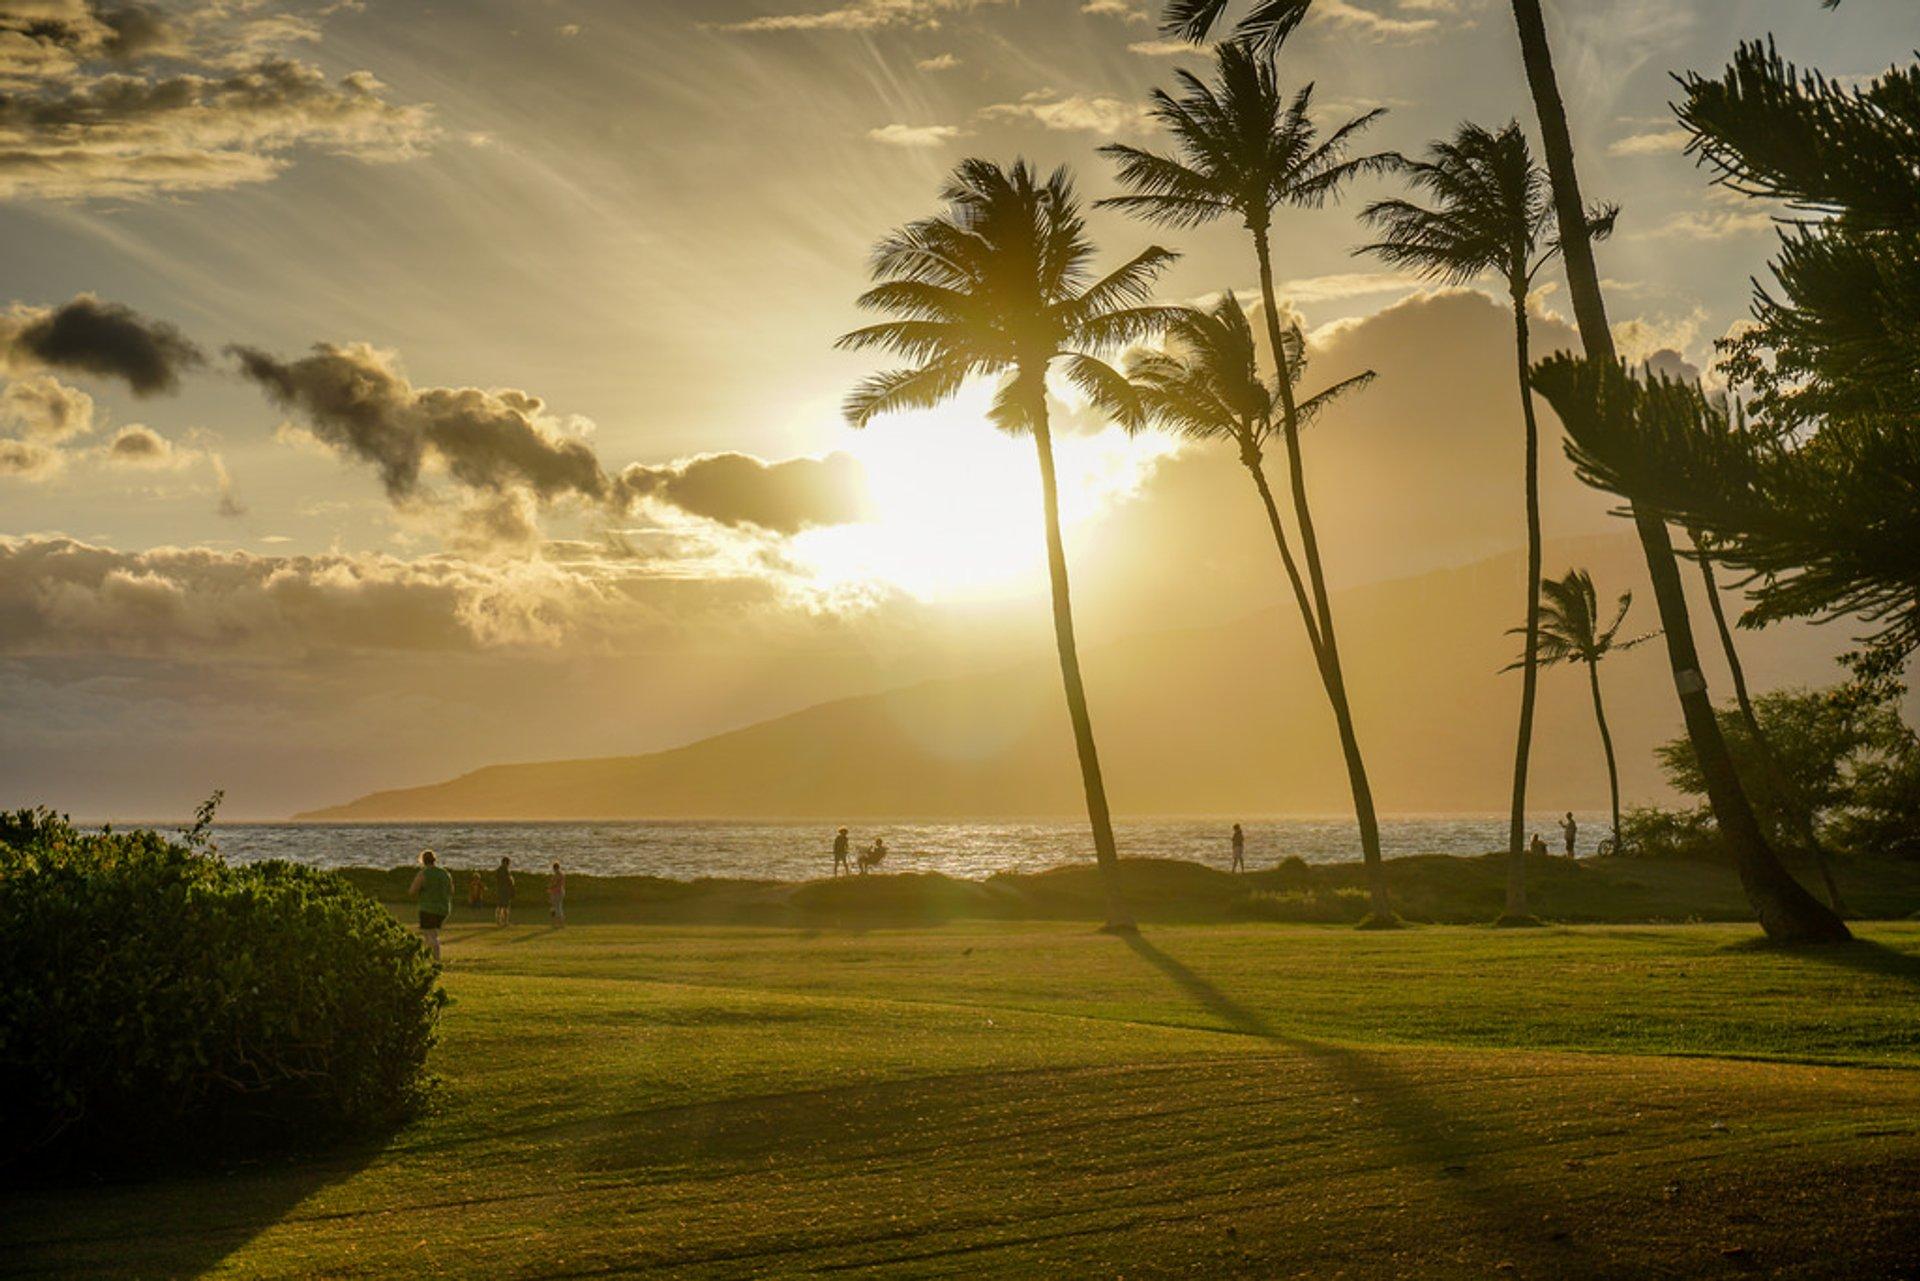 Summer (Dry Season) in Hawaii 2020 - Best Time